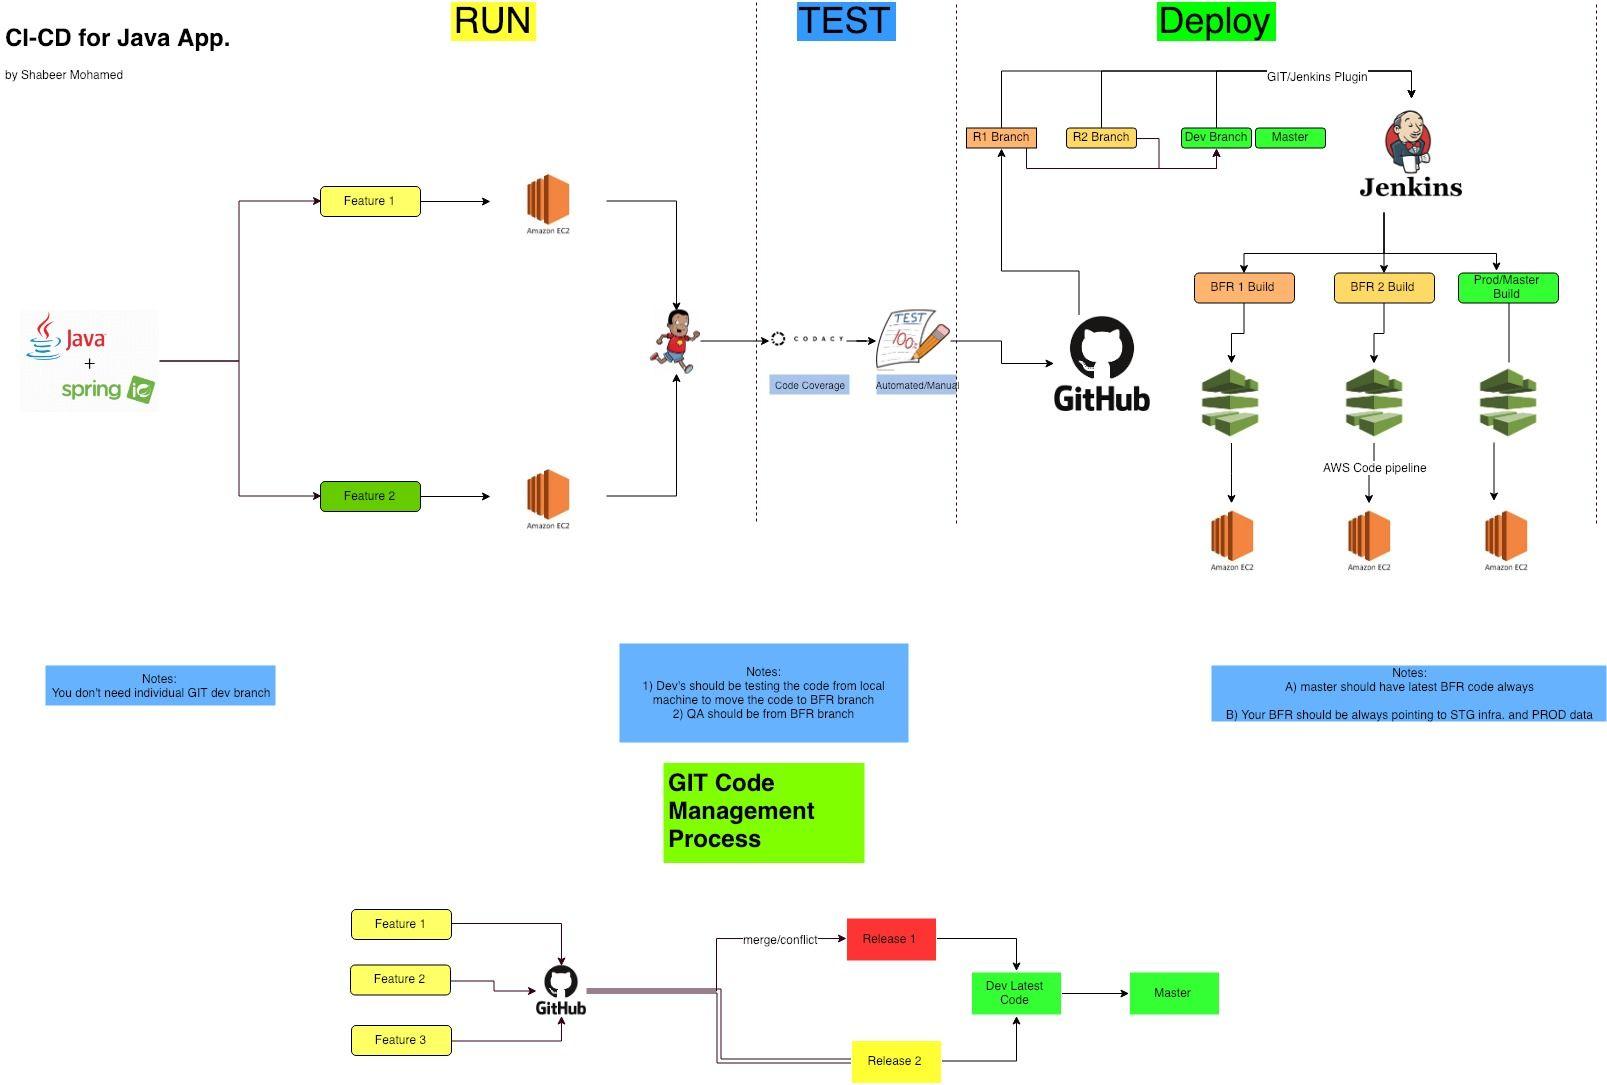 b52d2465026c71c44a98d8f40e0af004 - Deploy Java Application On Aws Ec2